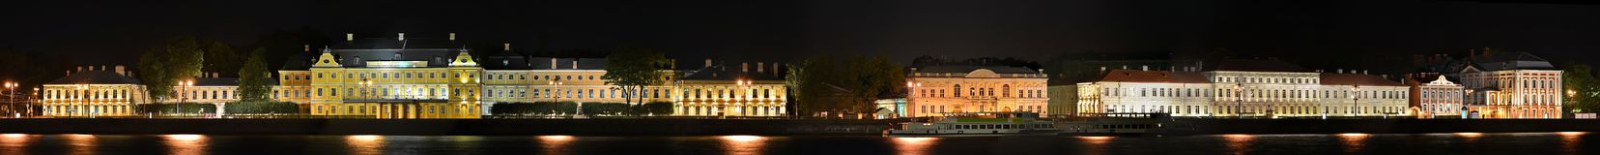 St Petersburg universitetarEmbankmentv slott Royaltyfri Bild